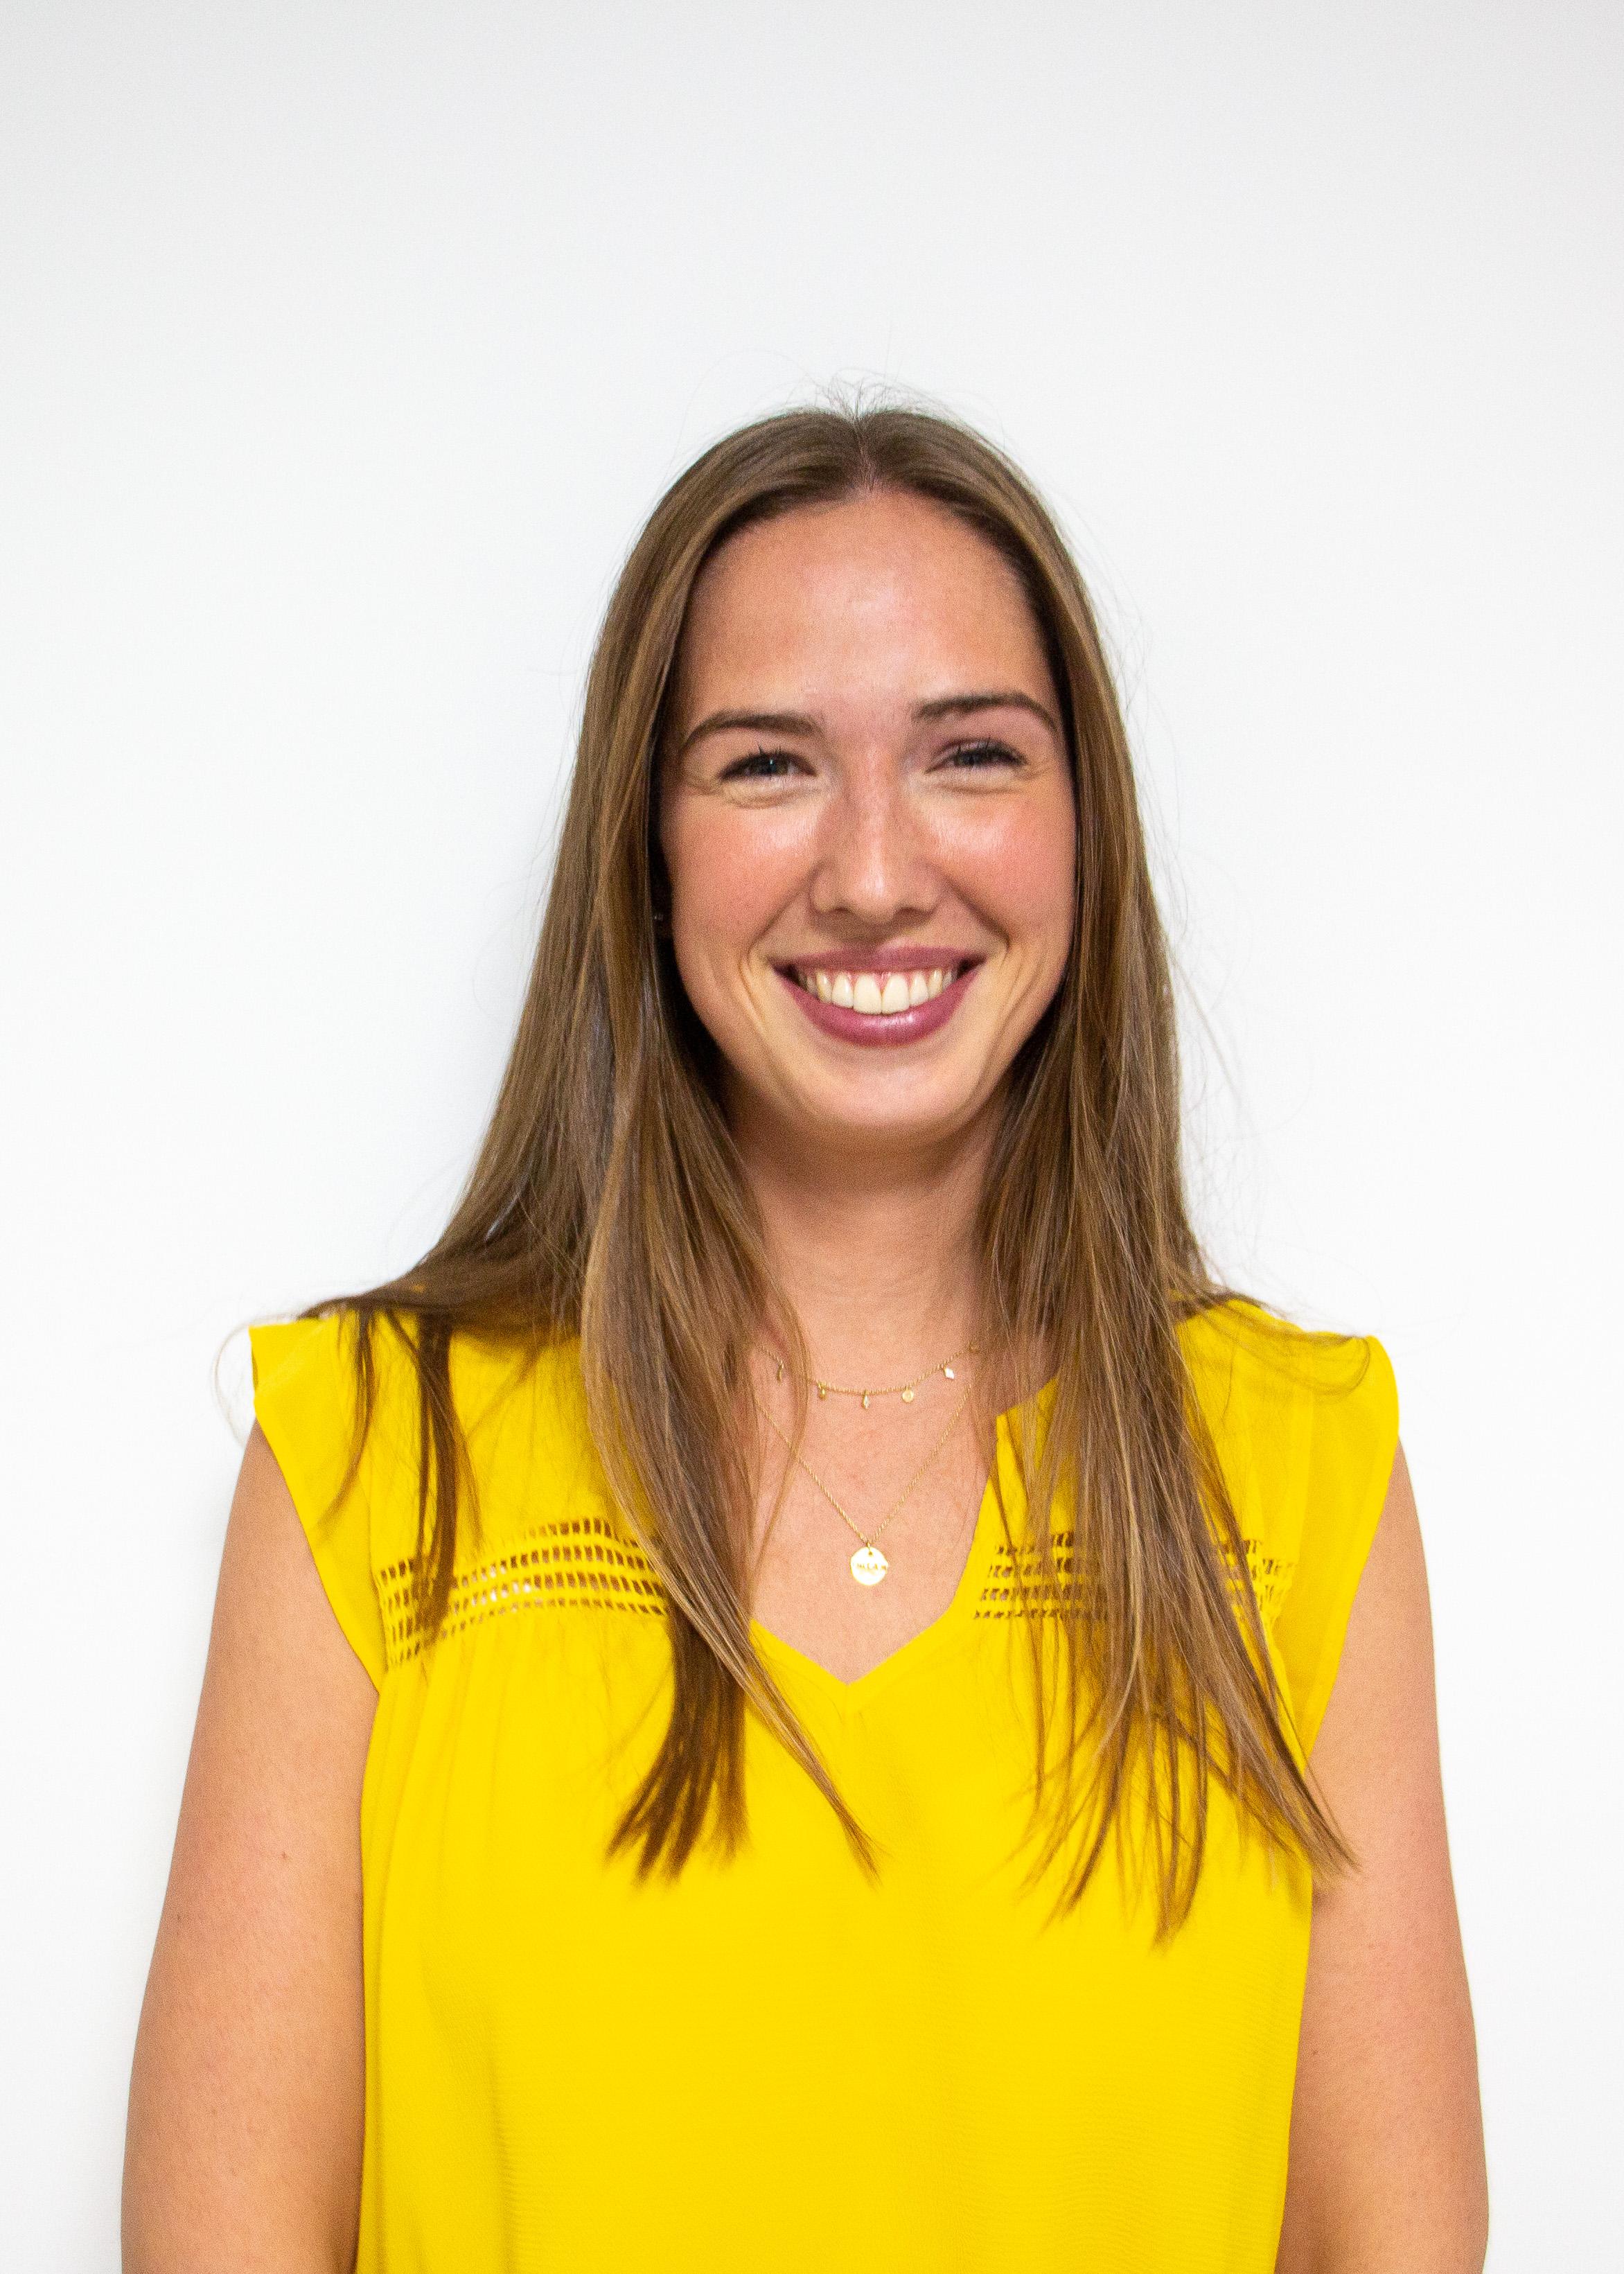 Natalie Meuleman